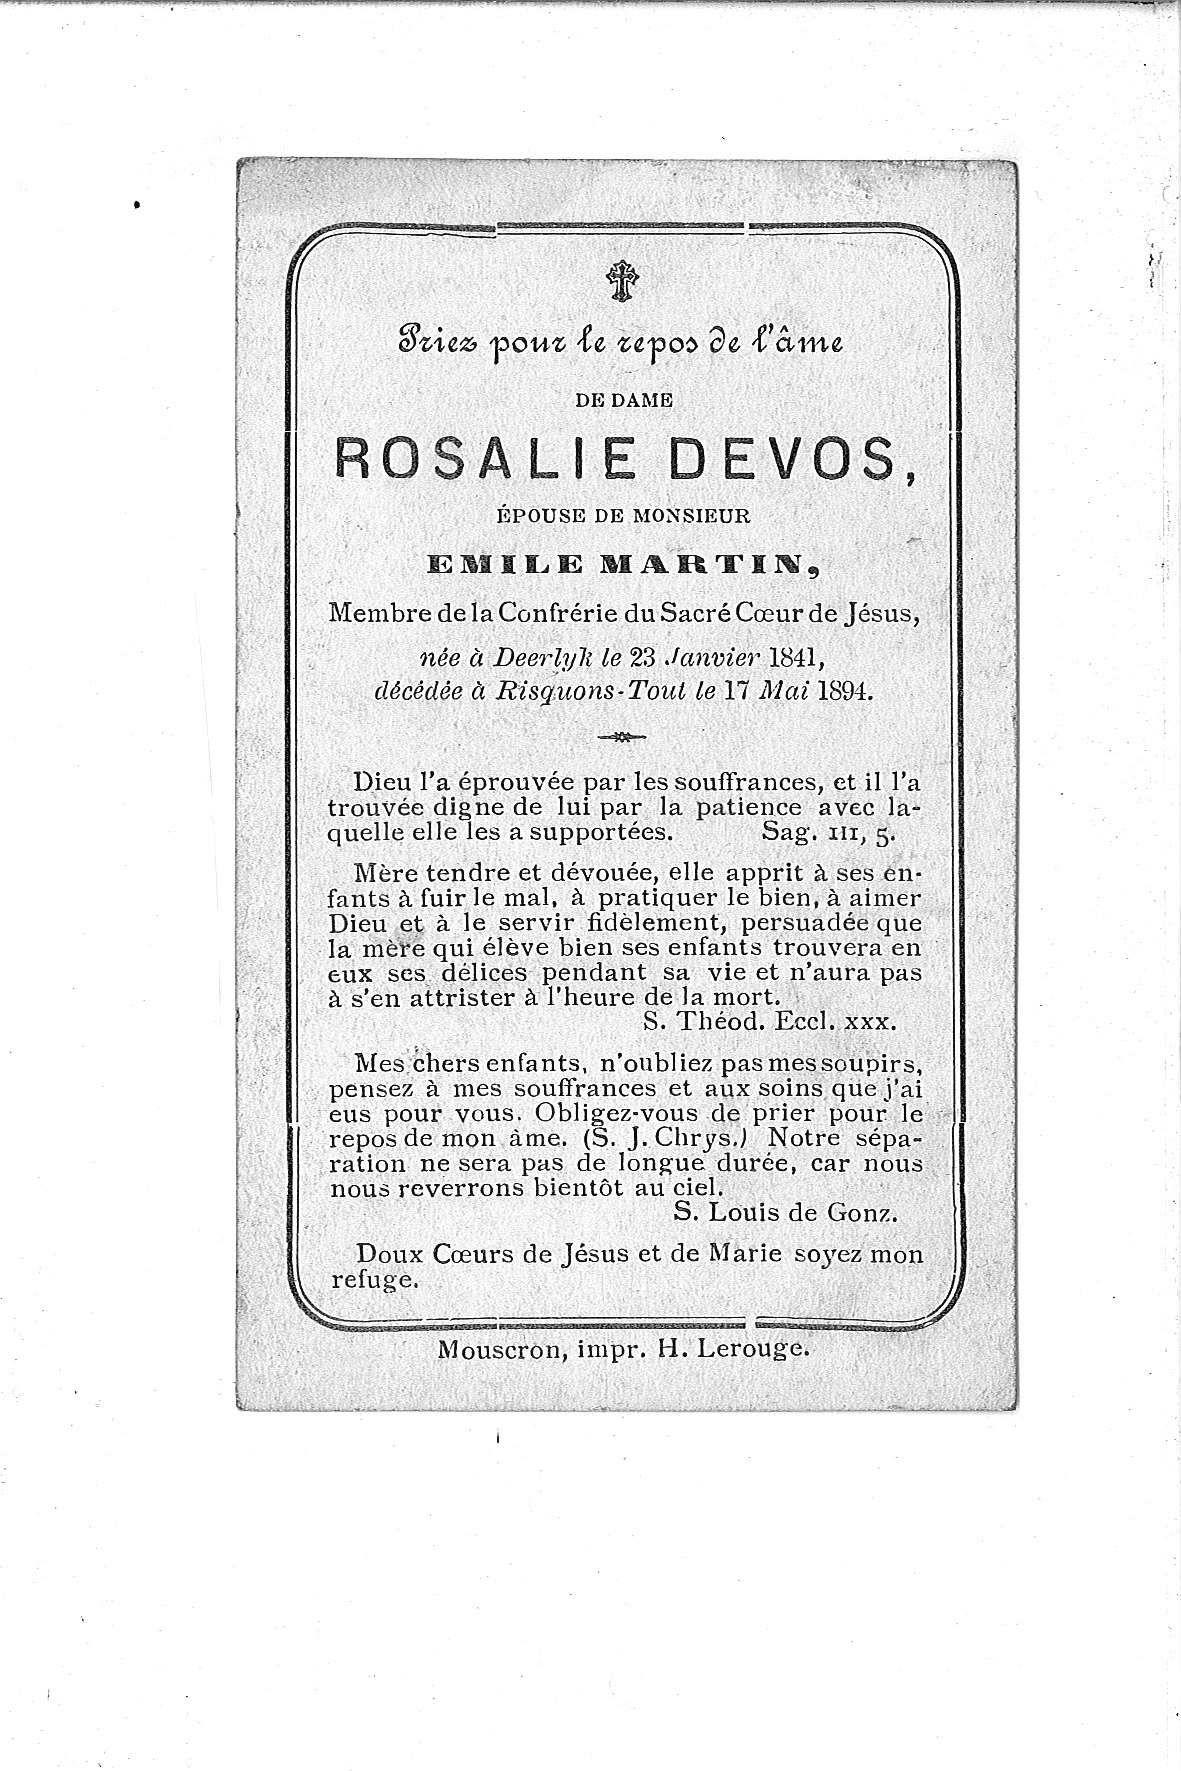 Rosalie (1894) 20120306152925_00132.jpg